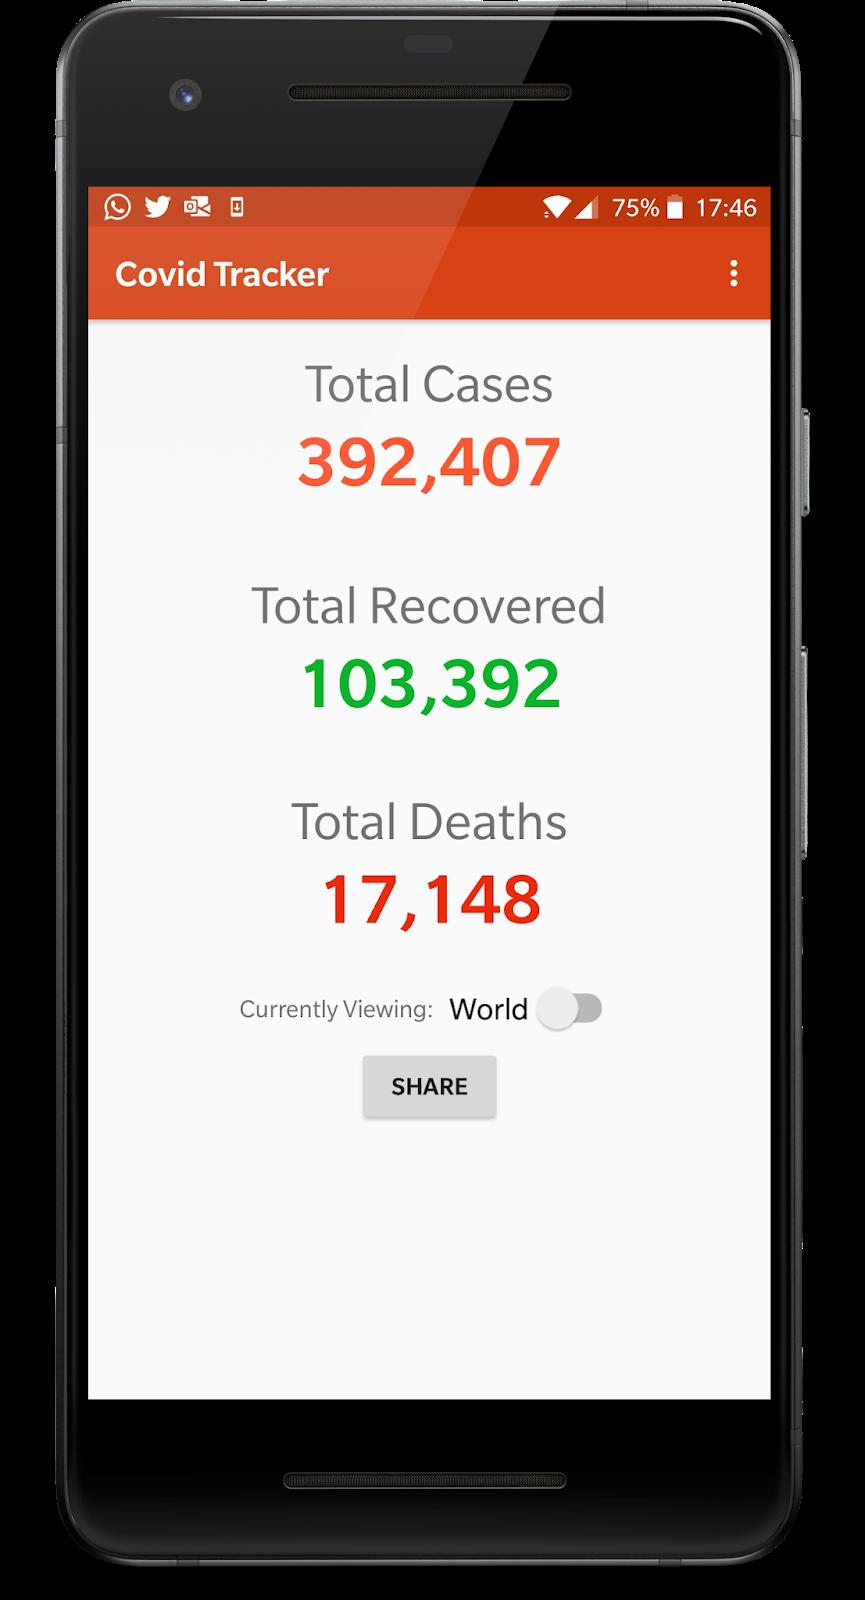 Covid Tracker - Essential Corona Virus Tracker App